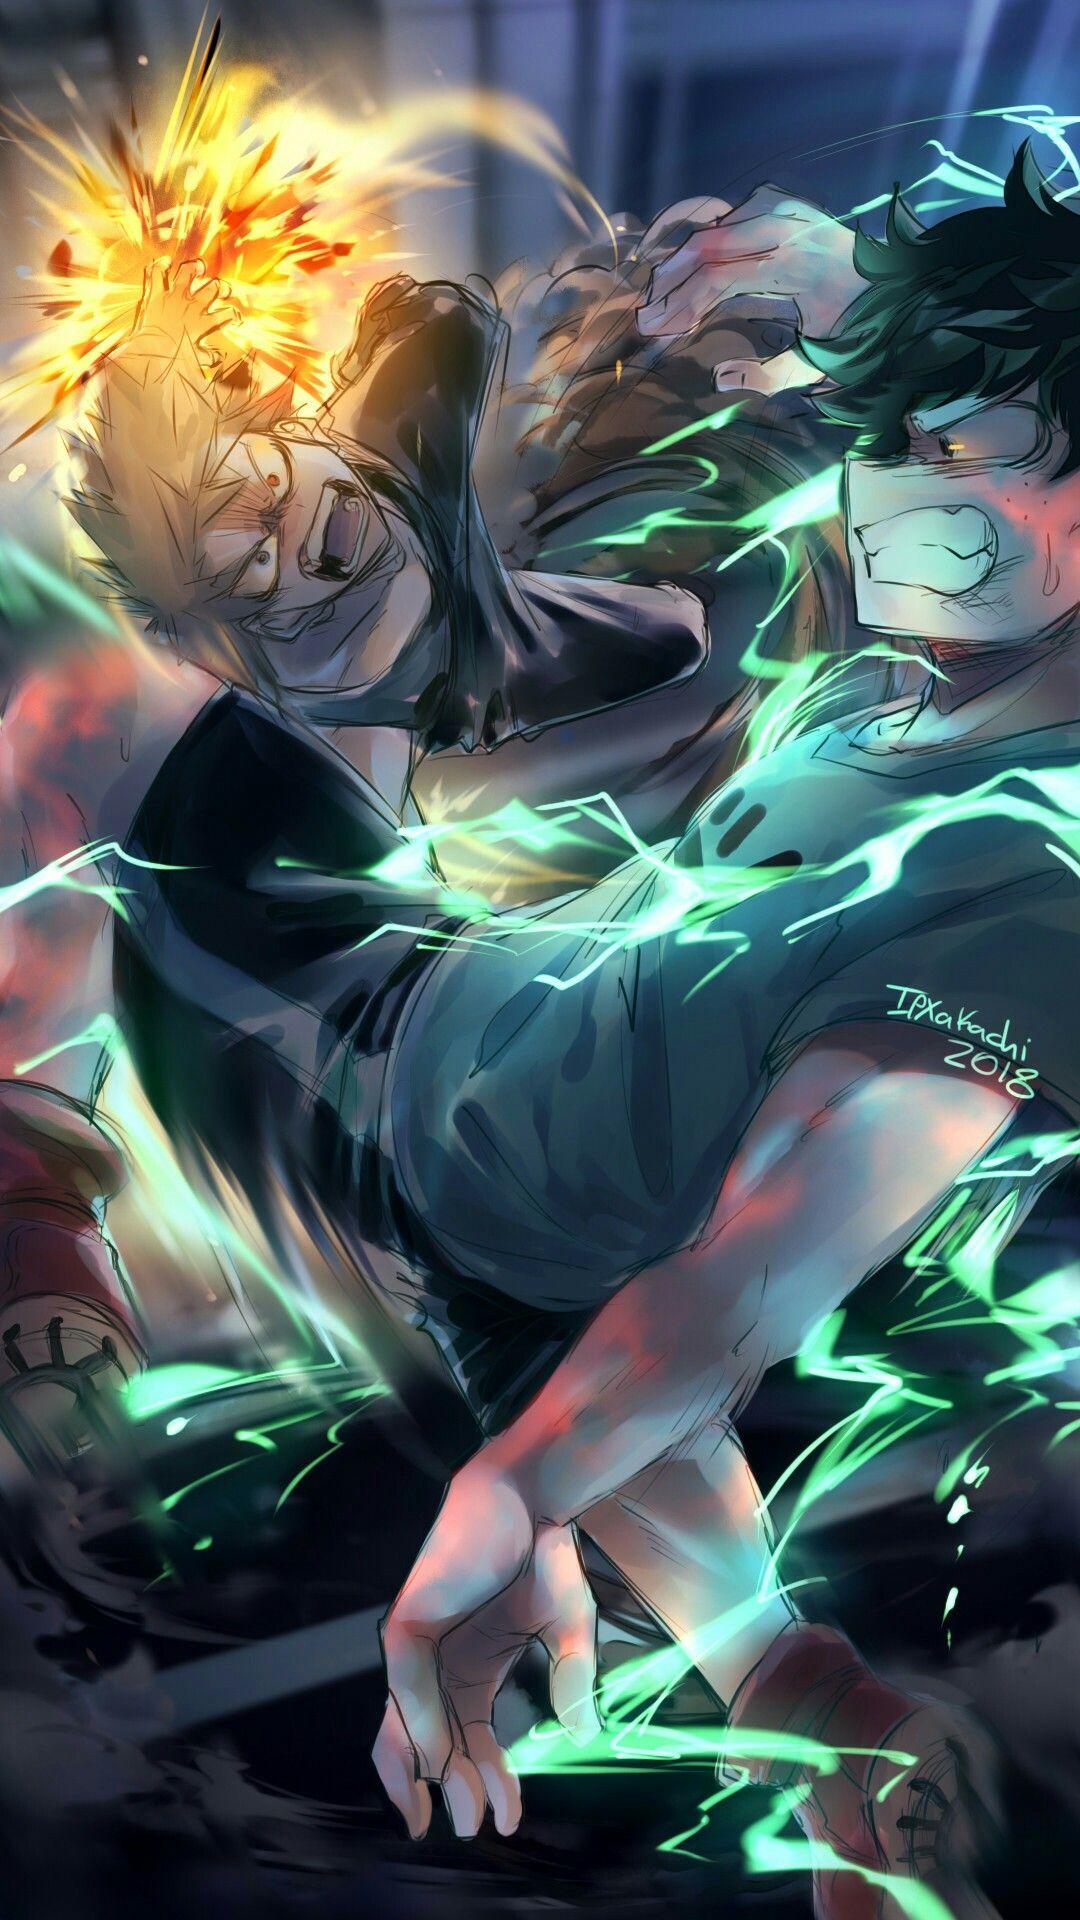 Bakugou and Midoriya My hero academia My héros